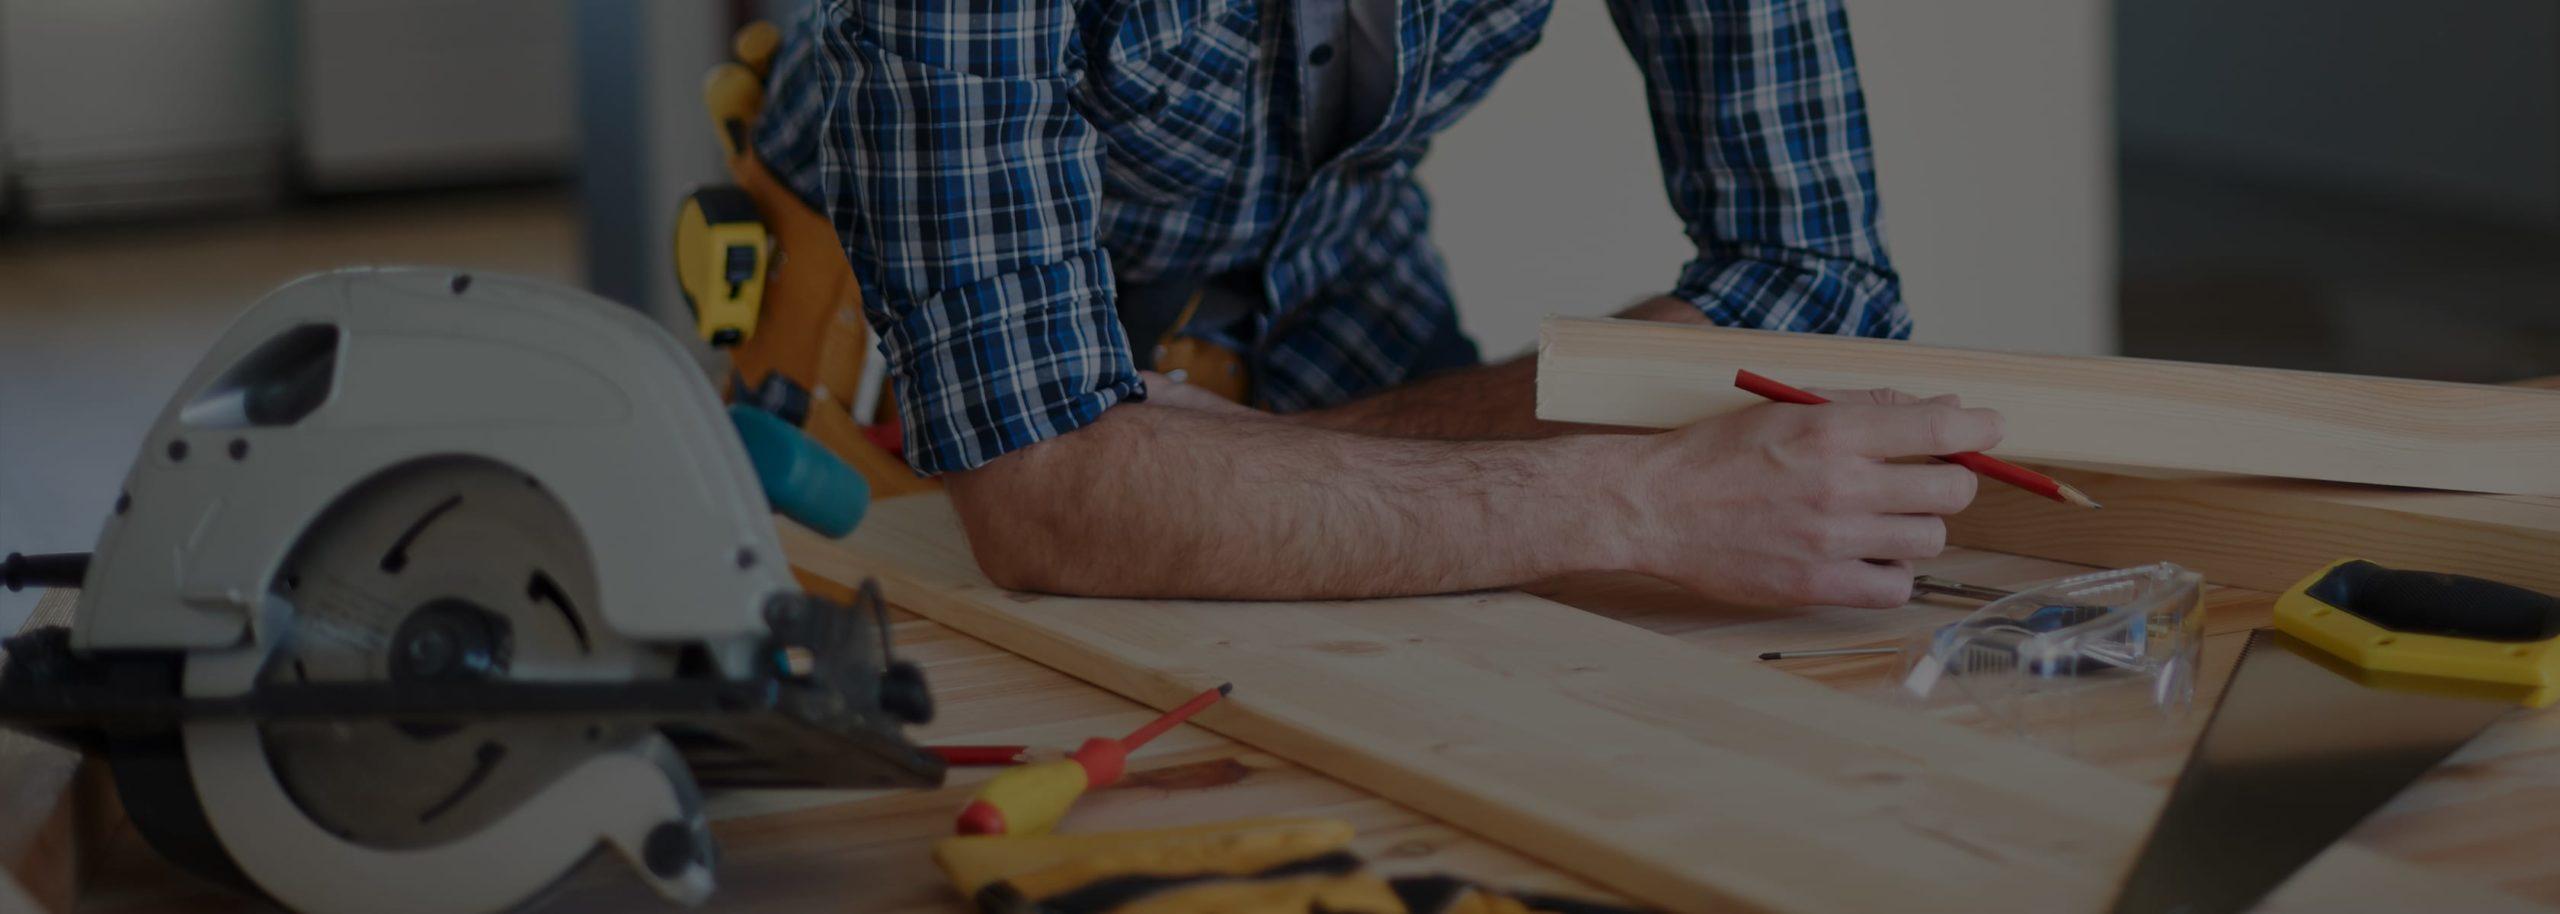 Handyman Leads header image